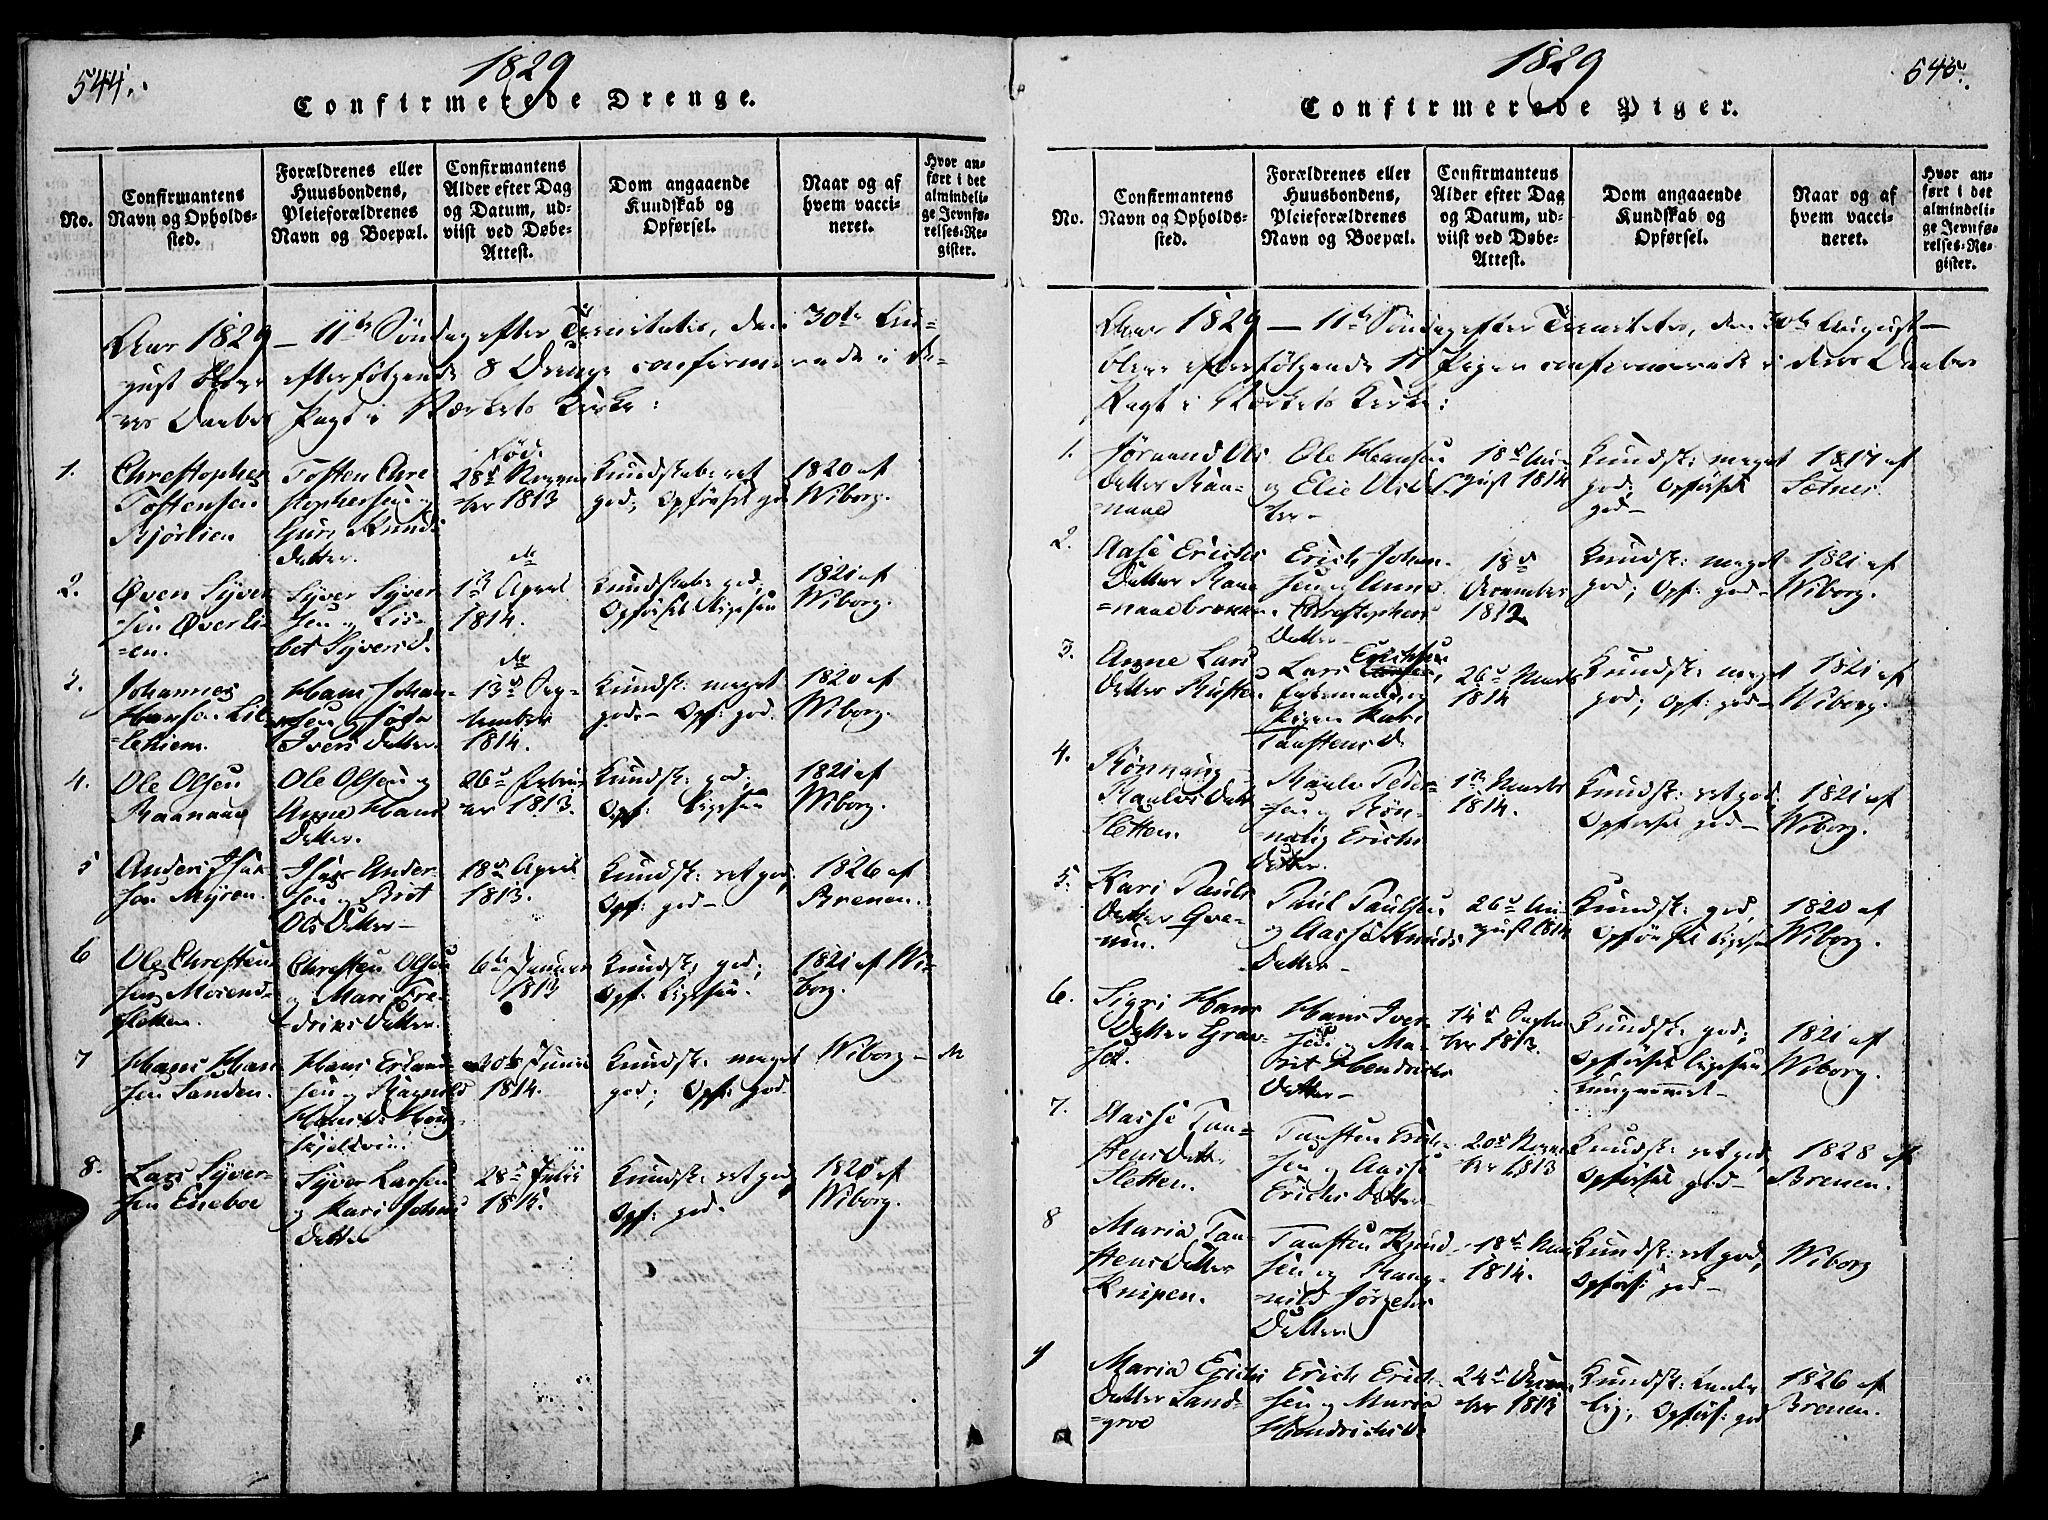 SAH, Lesja prestekontor, Ministerialbok nr. 4, 1820-1829, s. 544-545